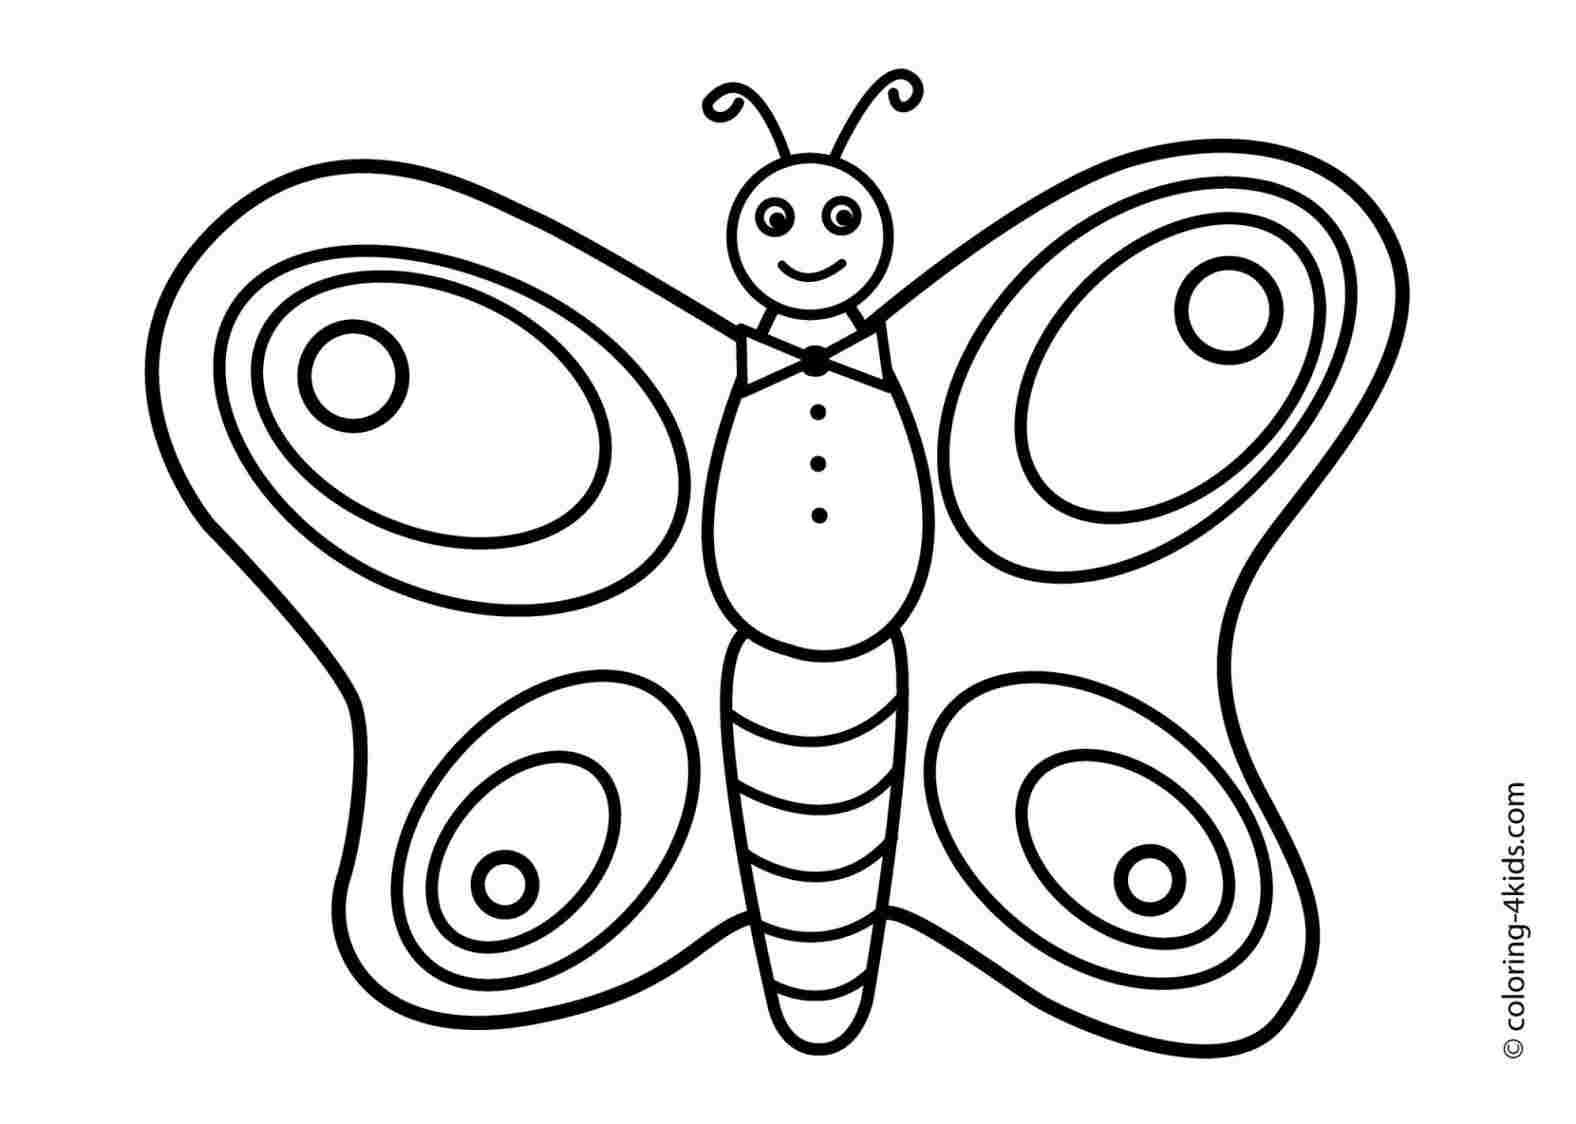 Butterfly drawings in pencil free download best butterfly drawings